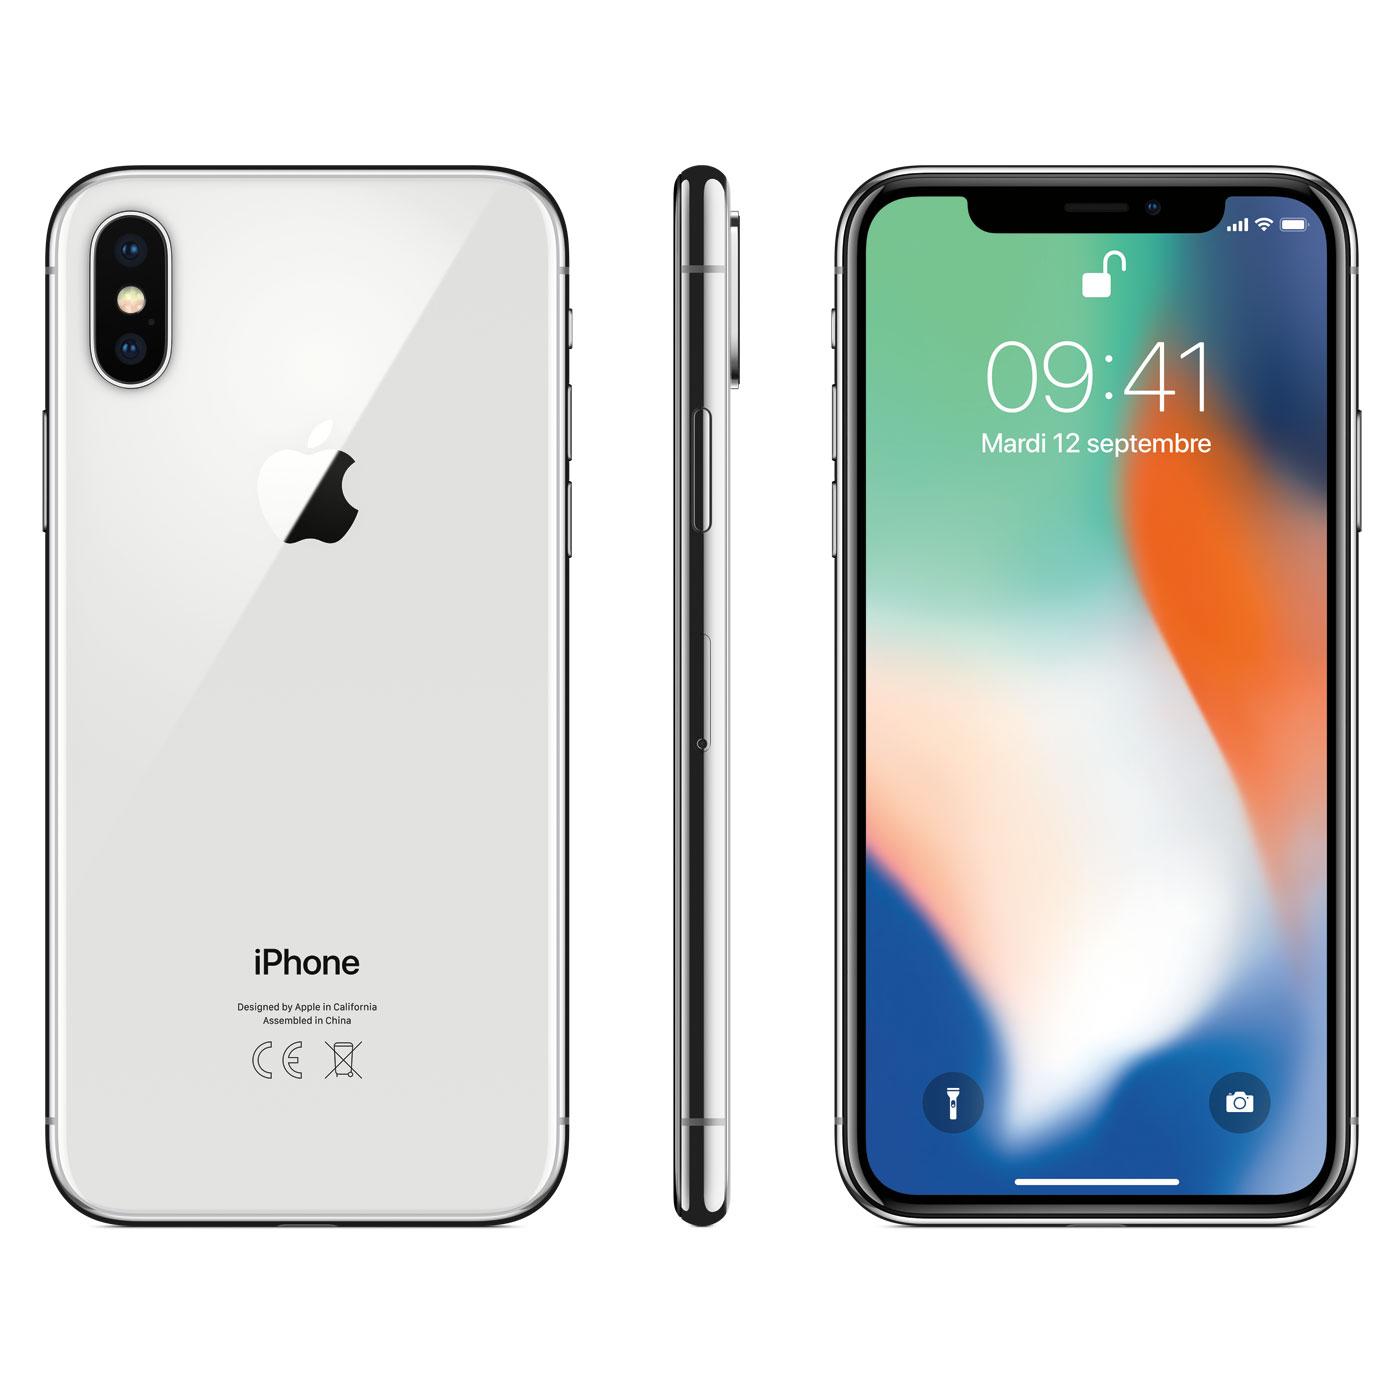 Apple iPhone X 256Go Argent - Téléphonie Apple - Cybertek.fr - 1